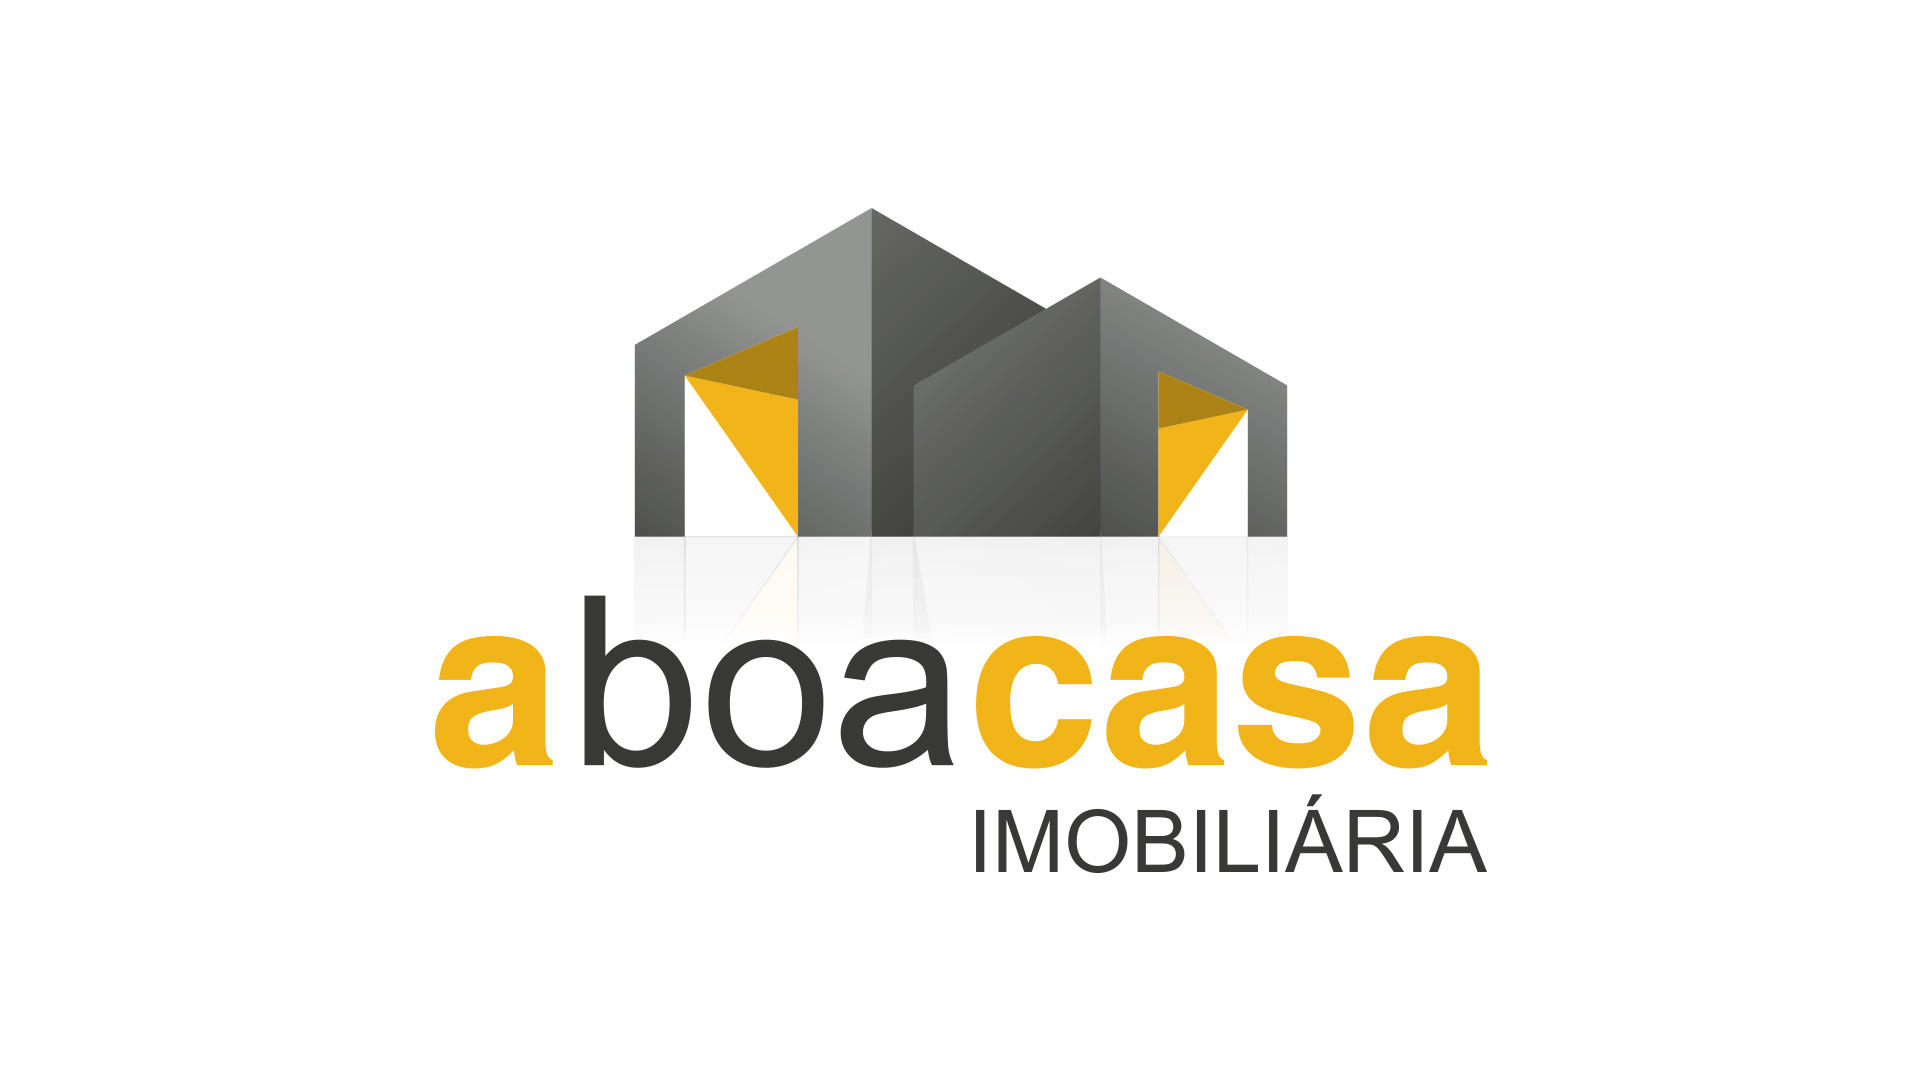 a boa casa-logotipo-imobiliária-design gráfico-publicidade